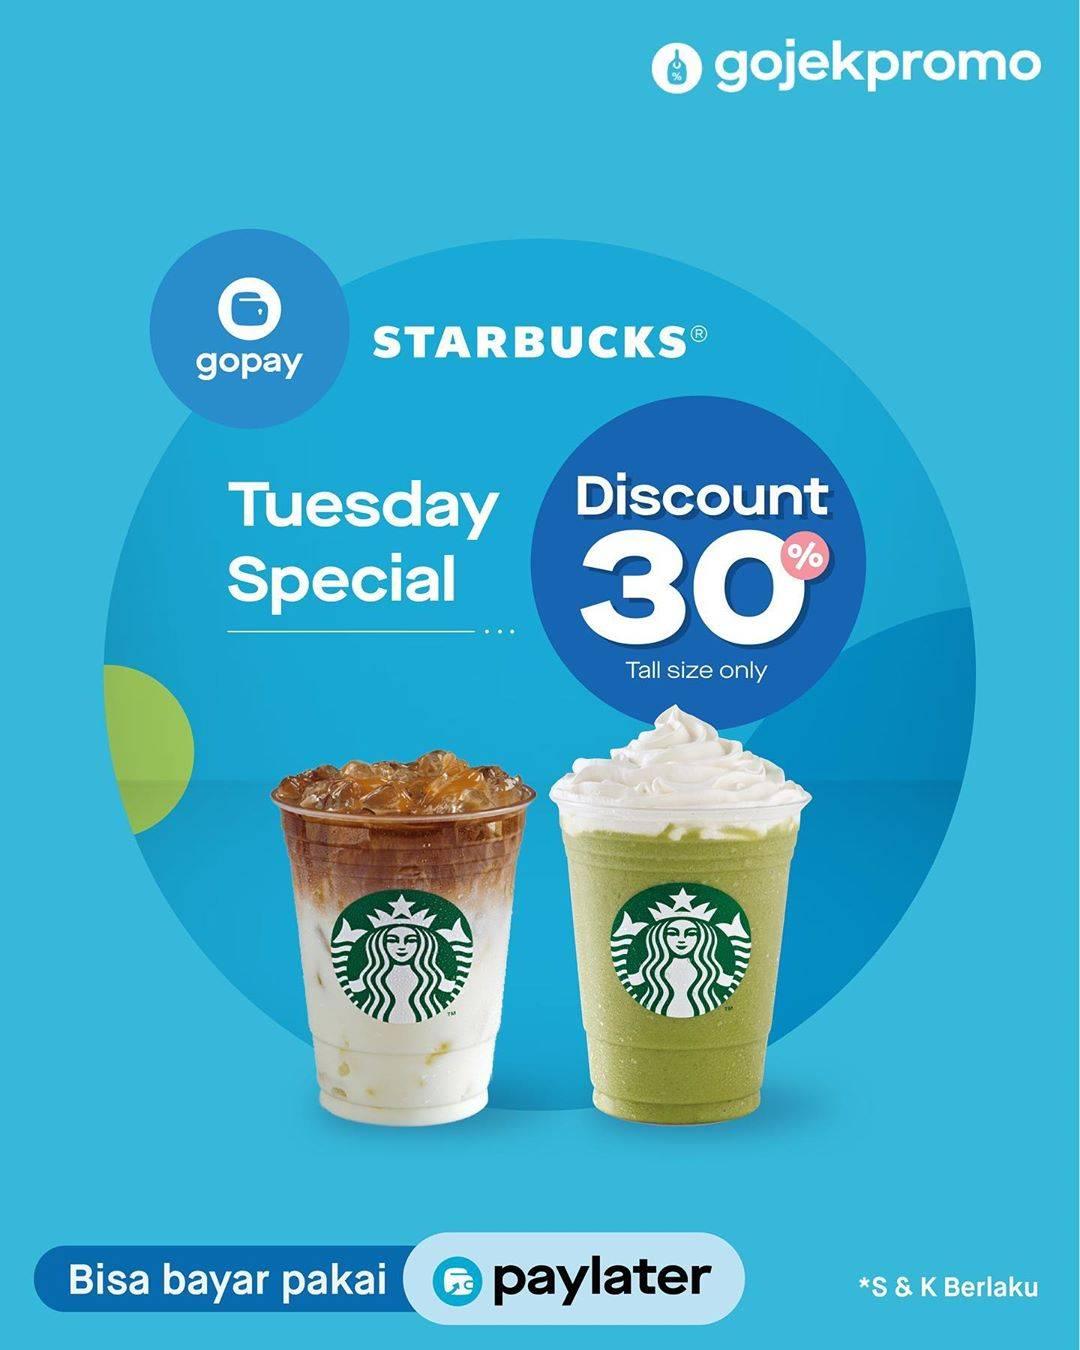 Diskon Starbucks Promo Spesial Hari Selasa, Diskon 30% Transaksi Melalui Gopay